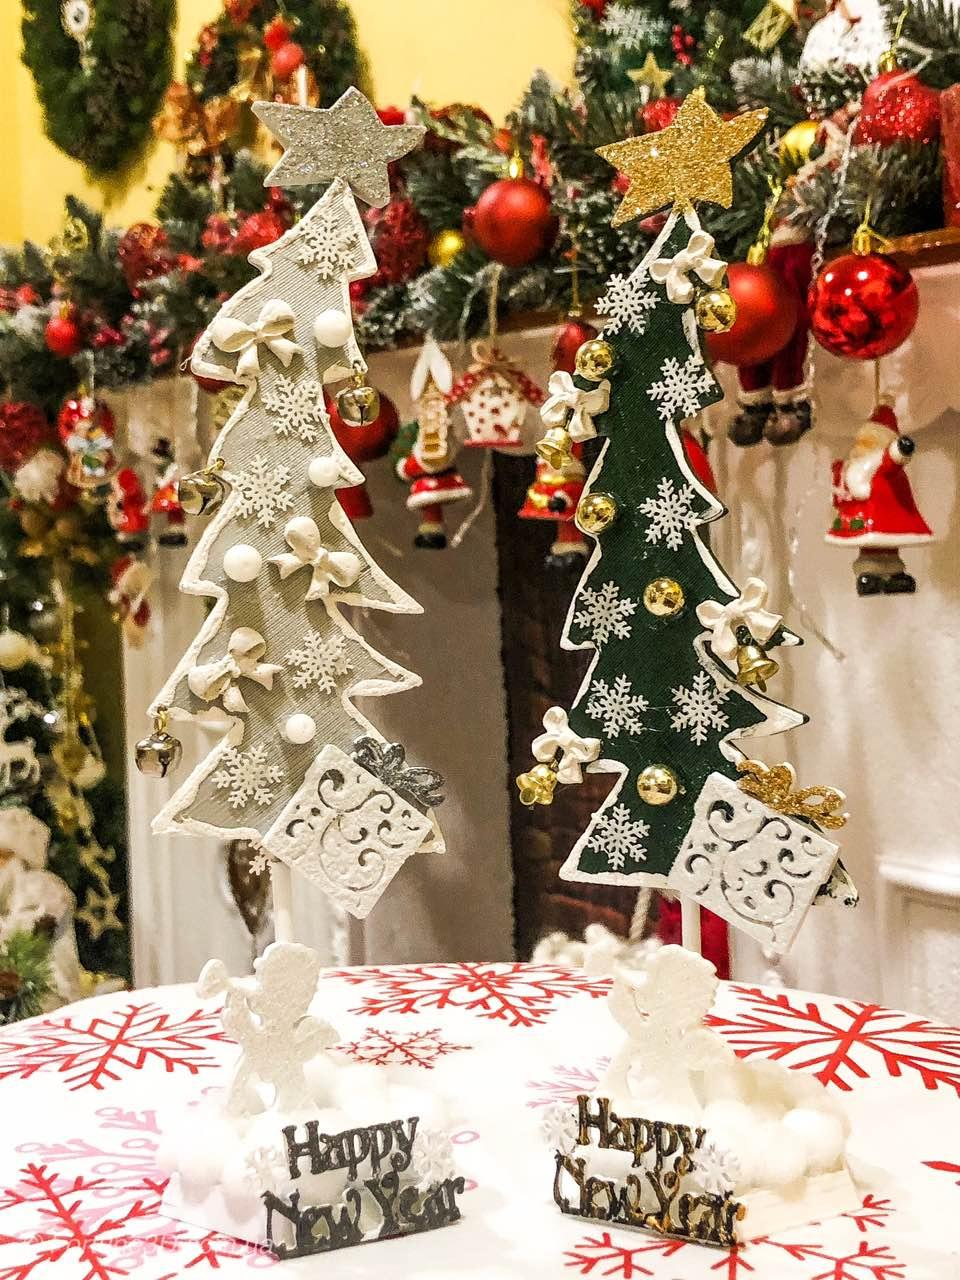 Новогодняя ёлка 2019 игрушка-сувенир, Новогодний декор Happy New Year и Merry Christmas